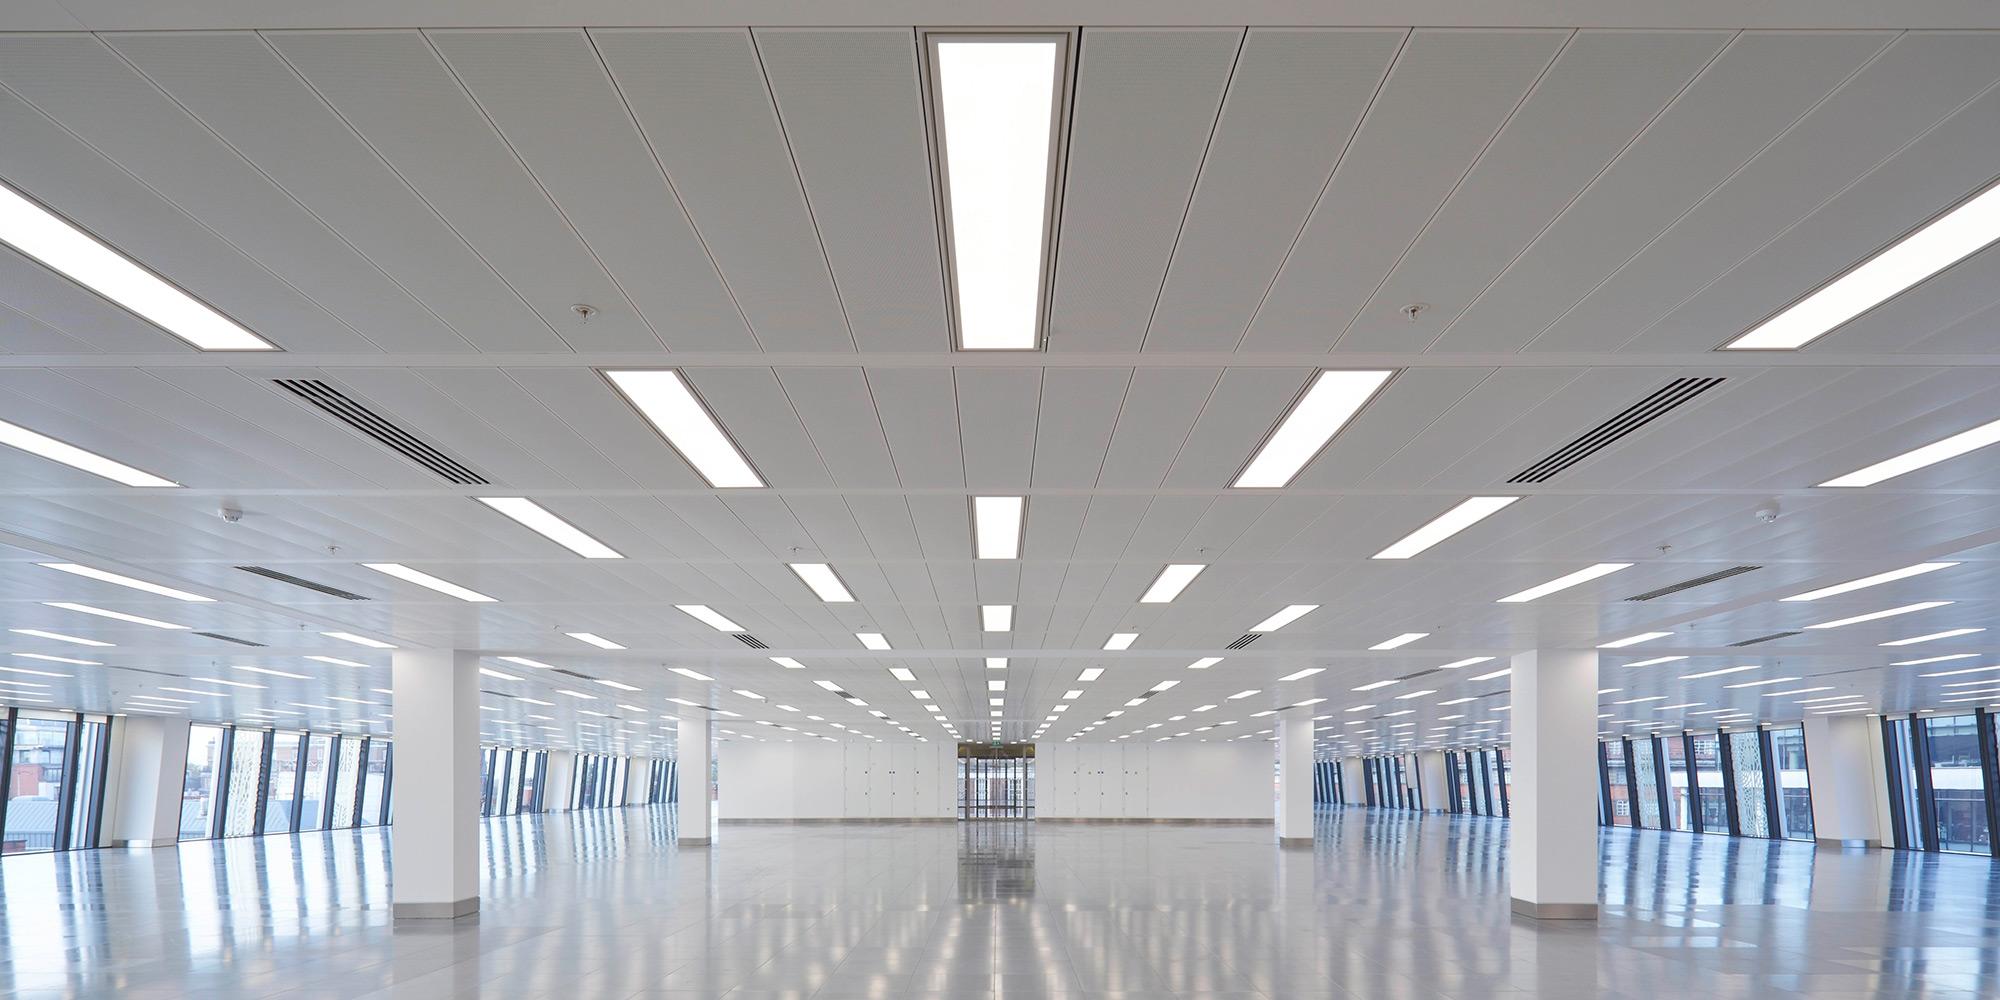 POE Lighting / IP Lighting